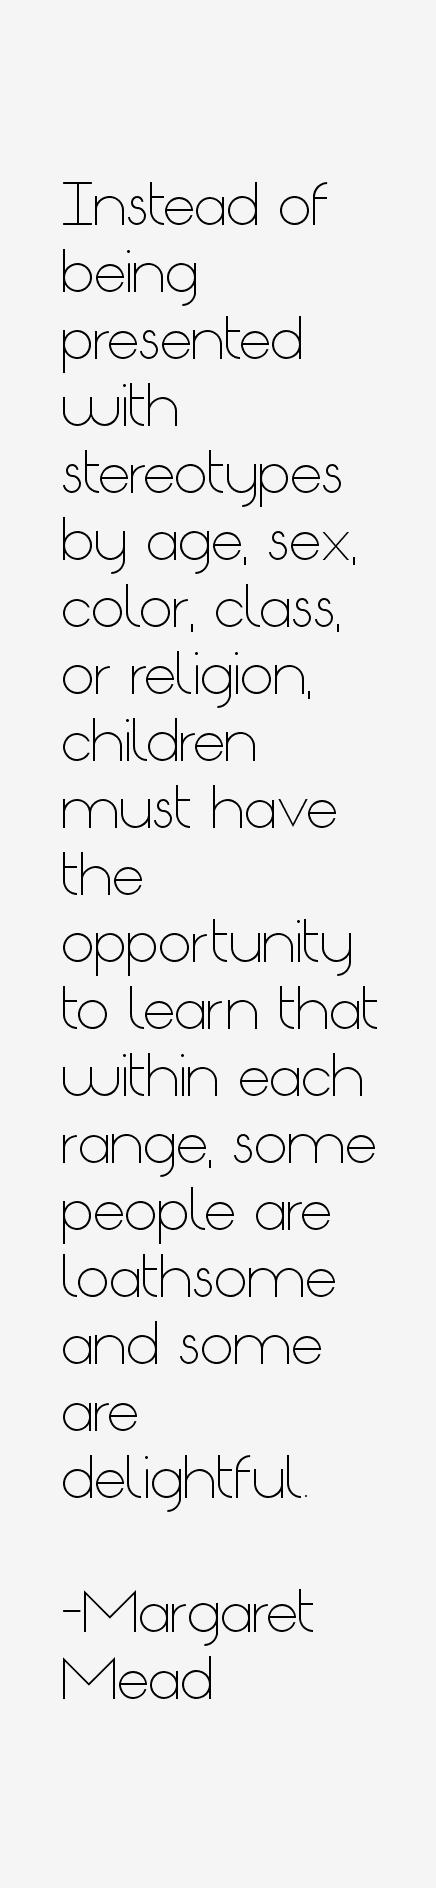 Margaret Mead Quotes